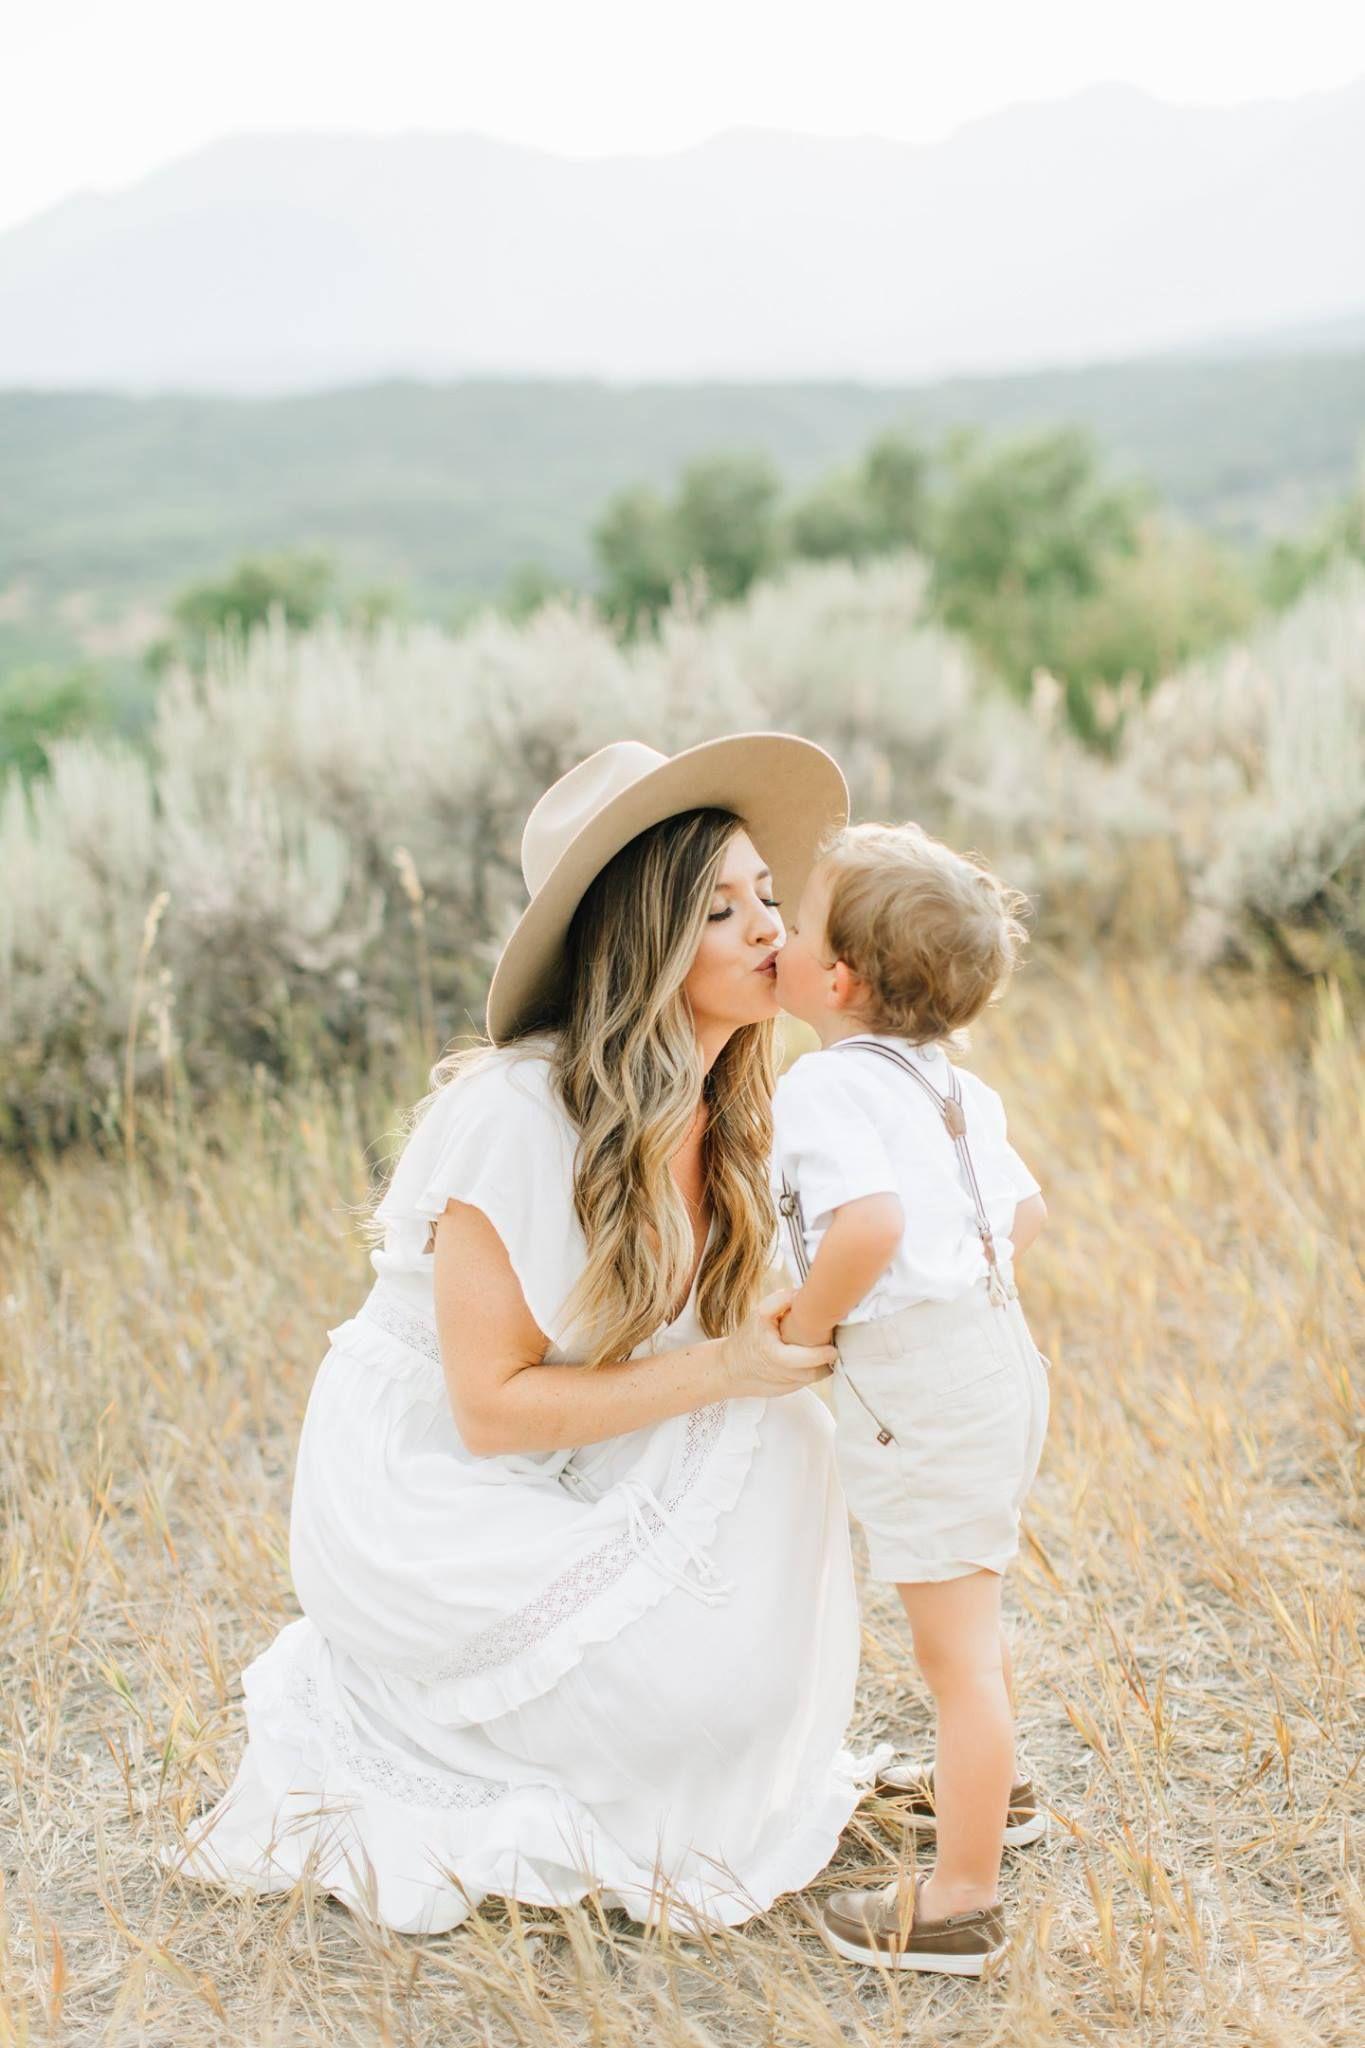 Мама и сын красивые картинки